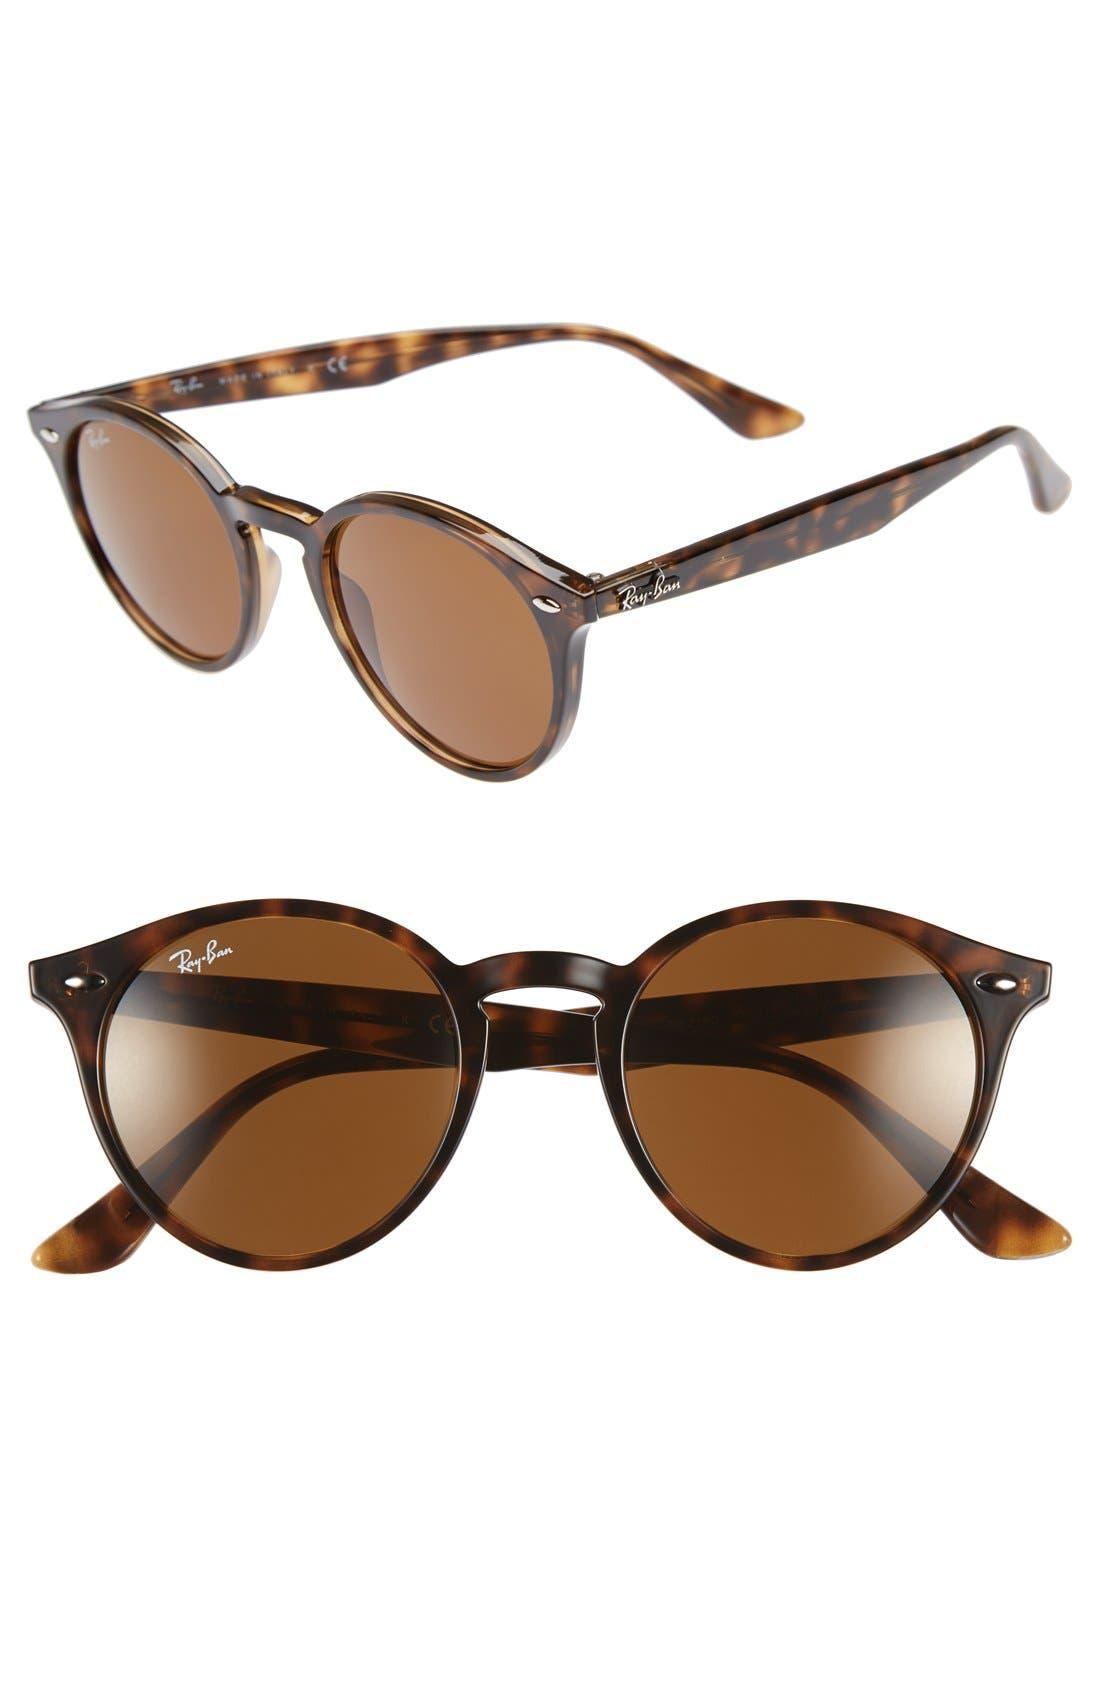 Highstreet 49mm Round Sunglasses,                         Main,                         color, Dark Havana